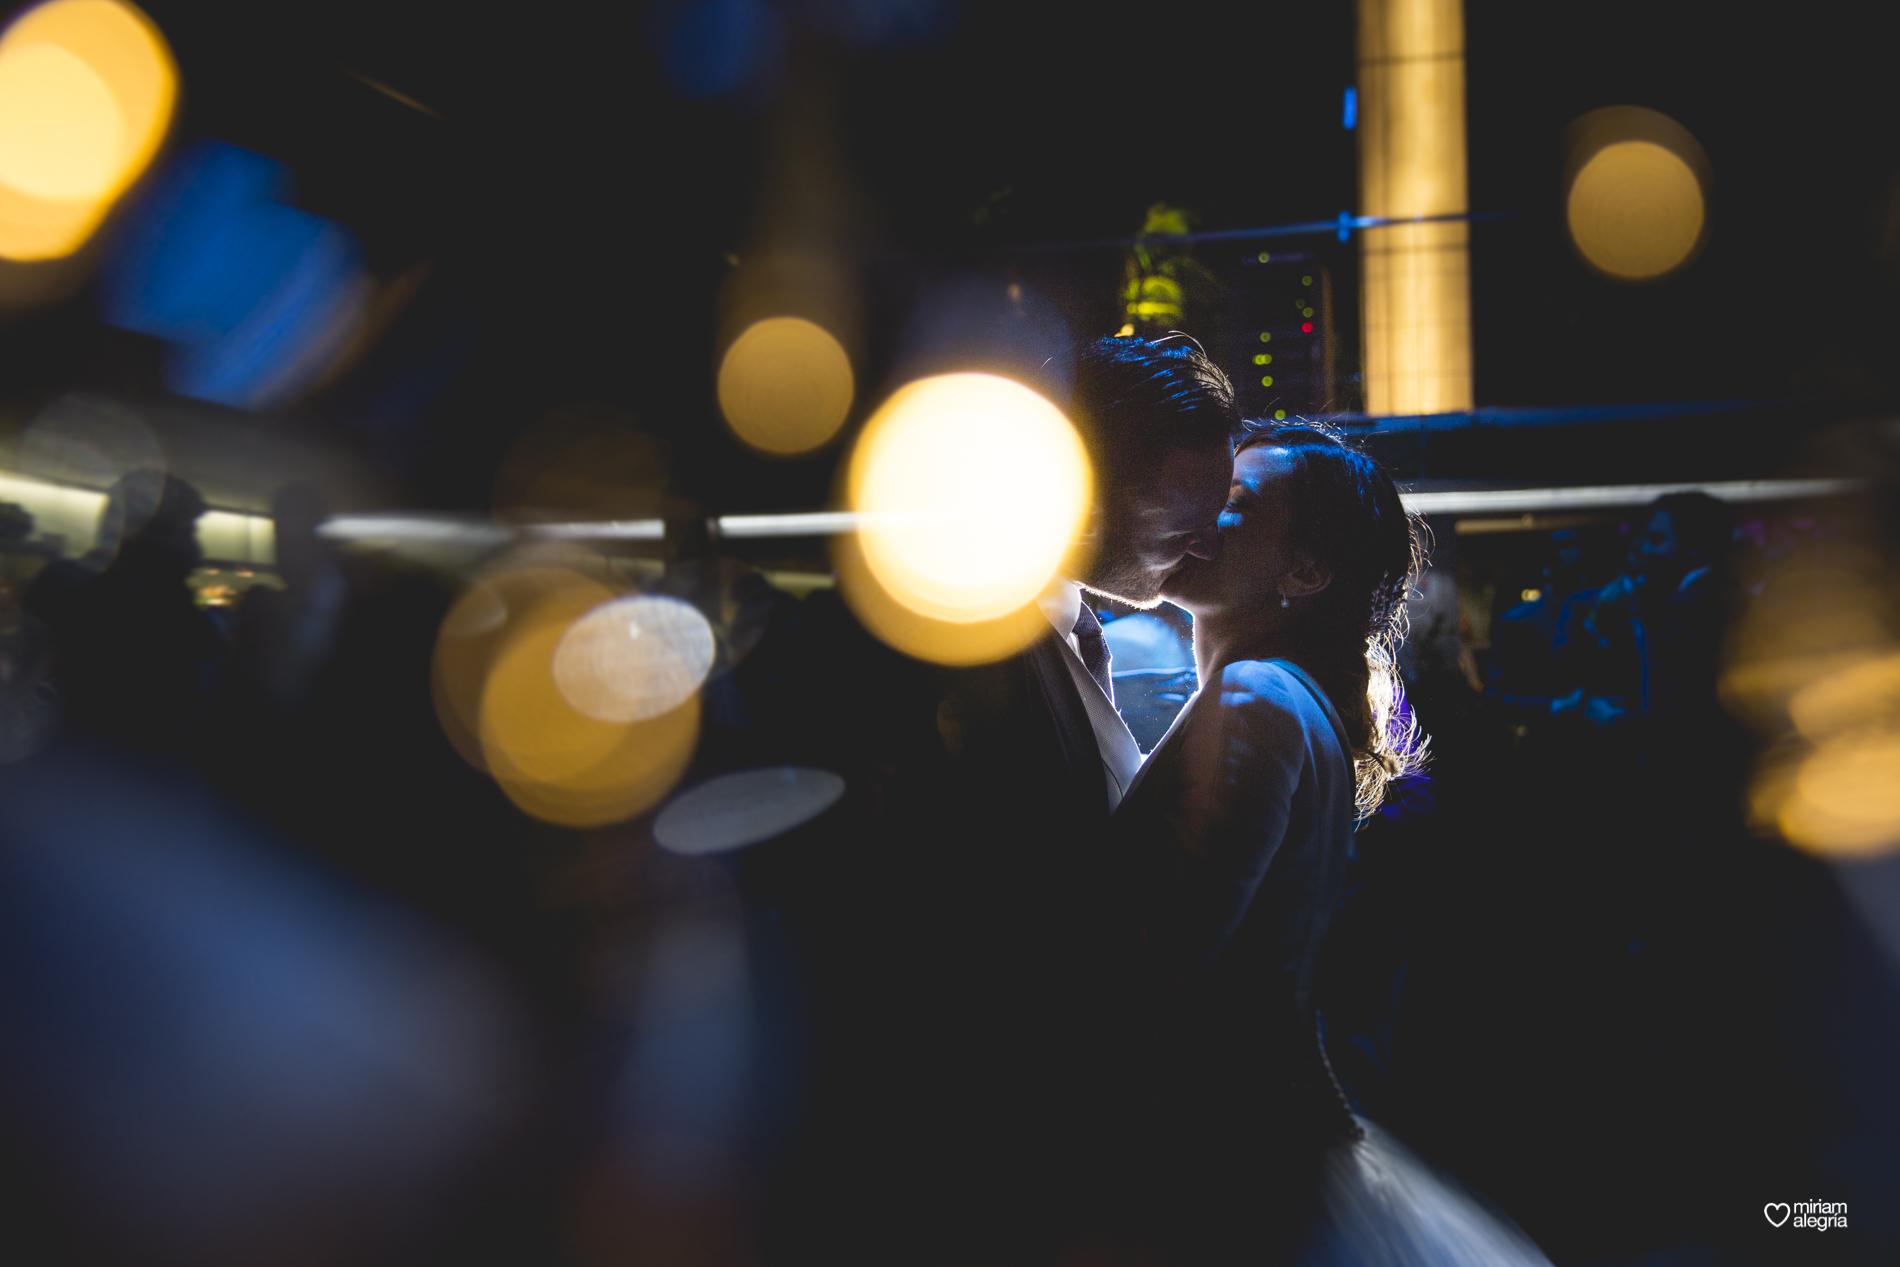 boda-en-la-catedral-de-murcia-miriam-alegria-fotografos-boda-murcia-87